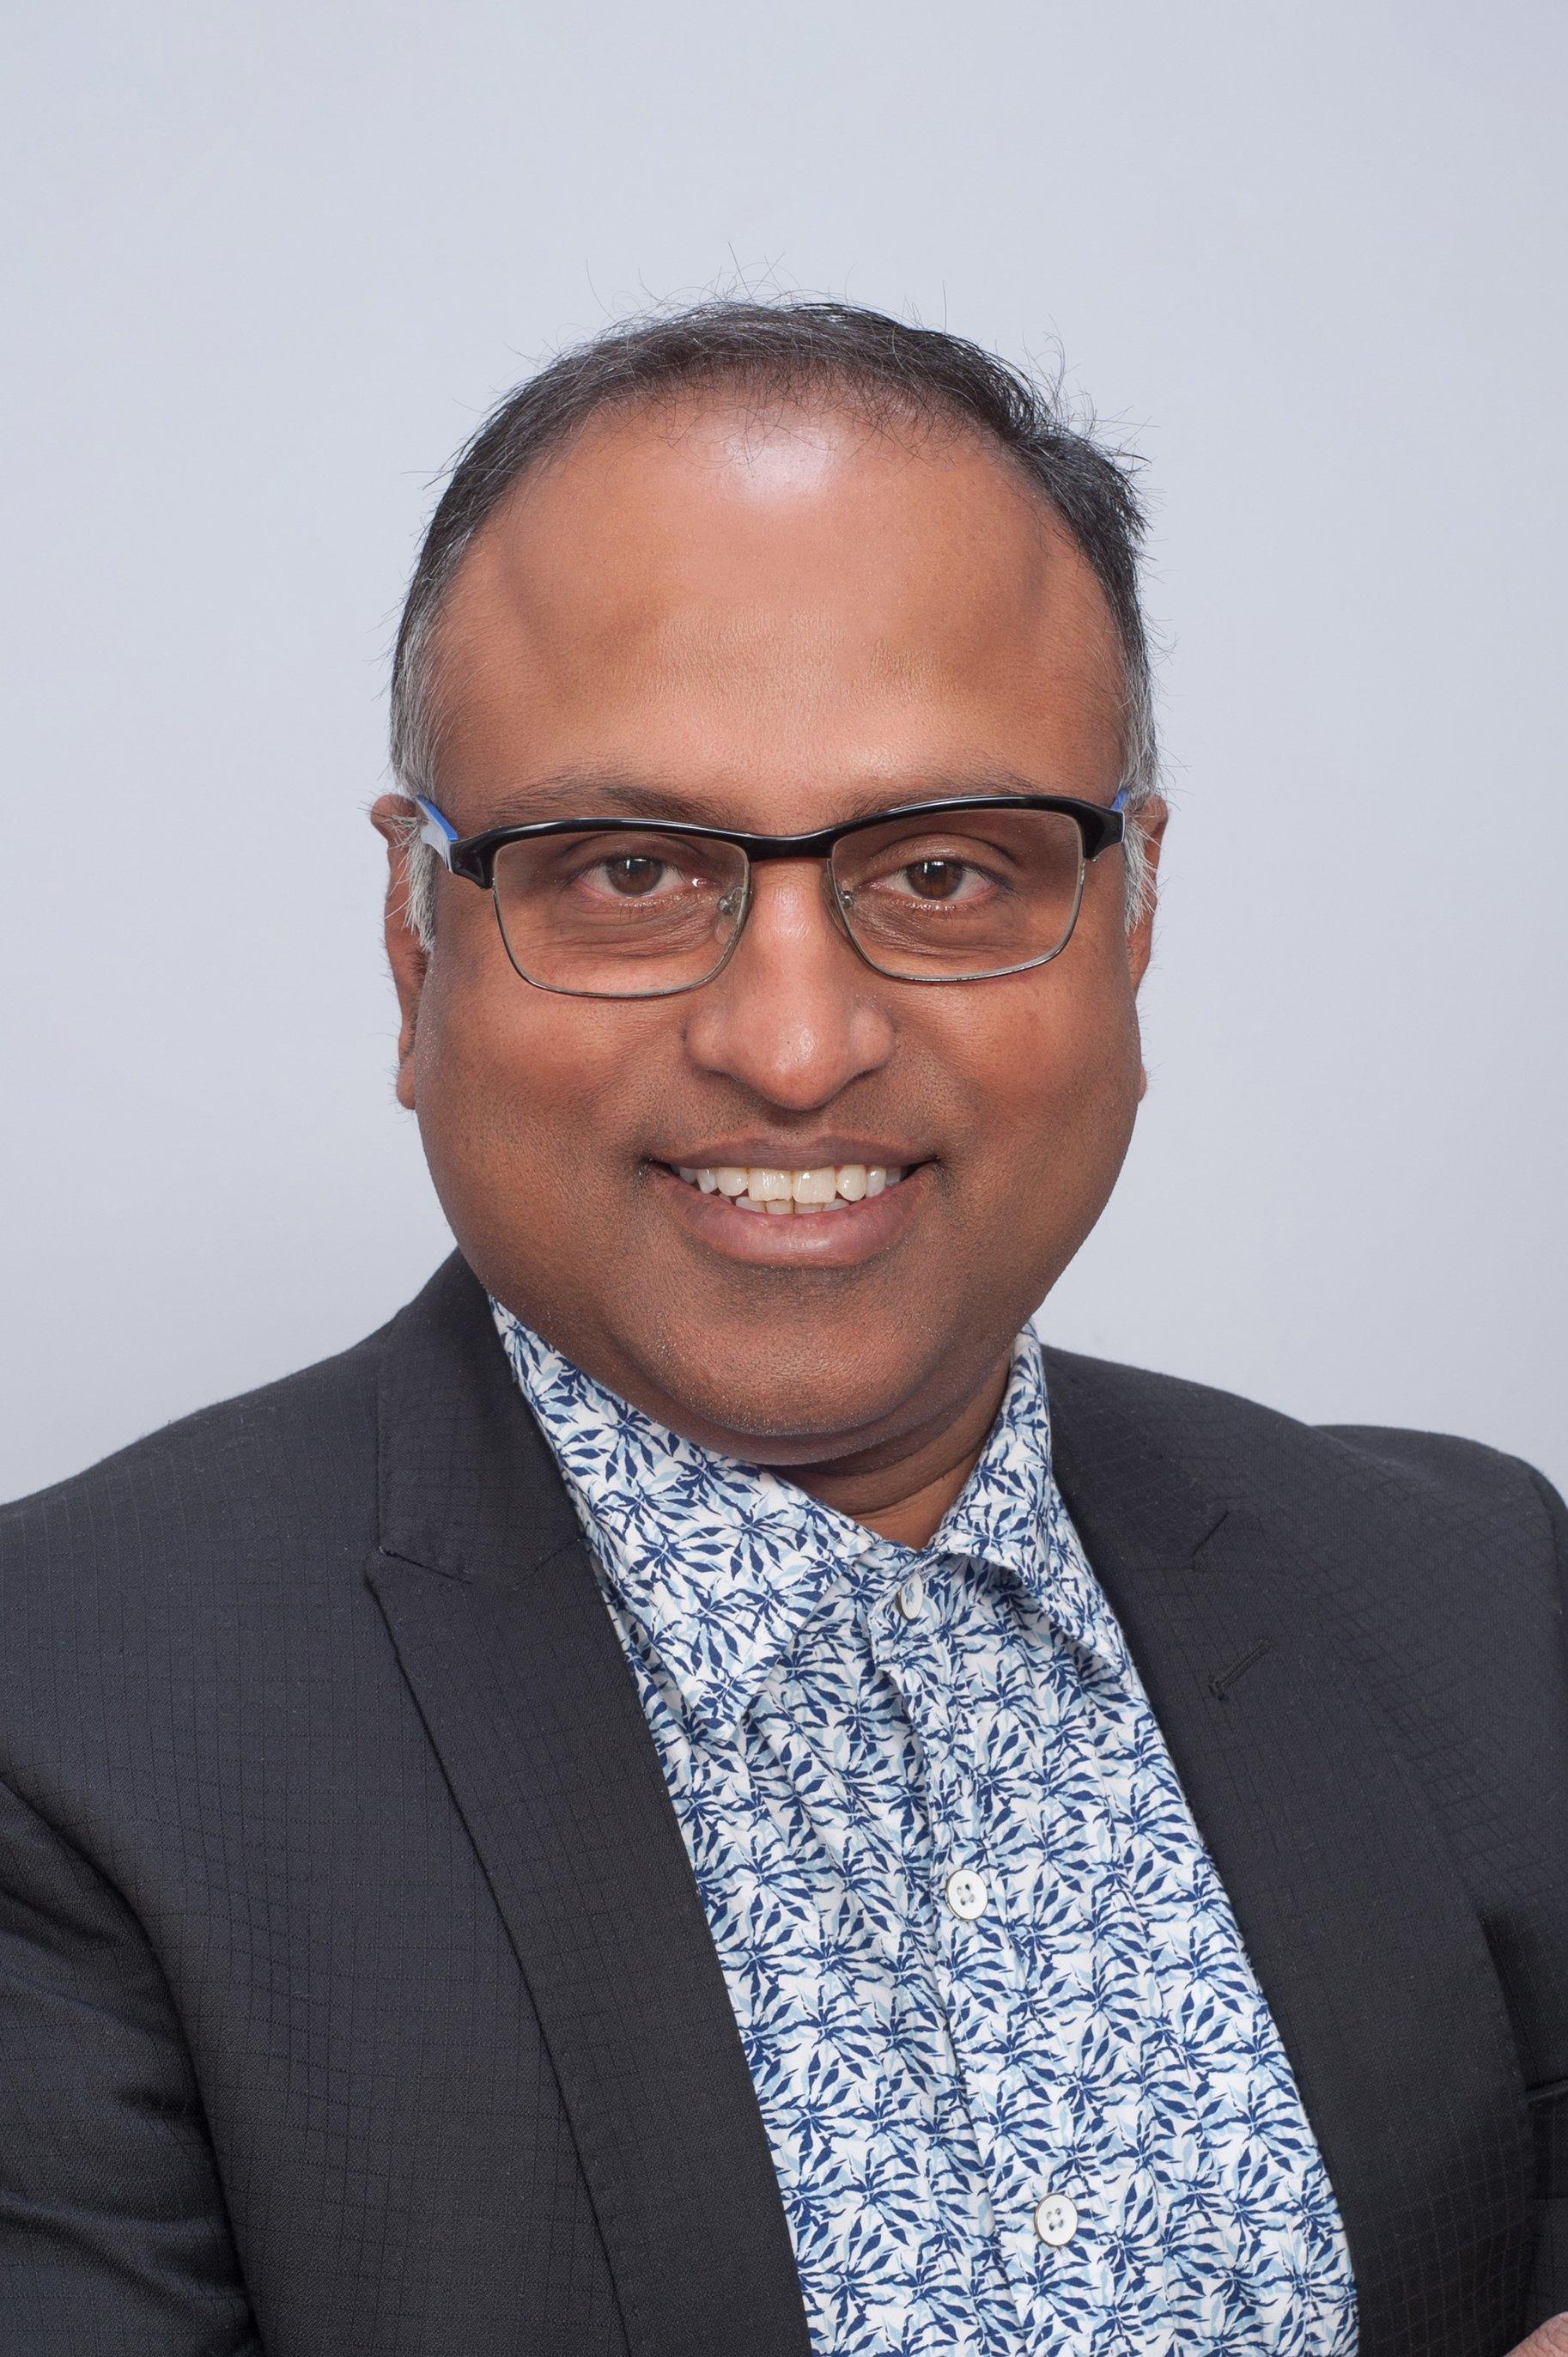 Ananda Krishnan Srinivasan